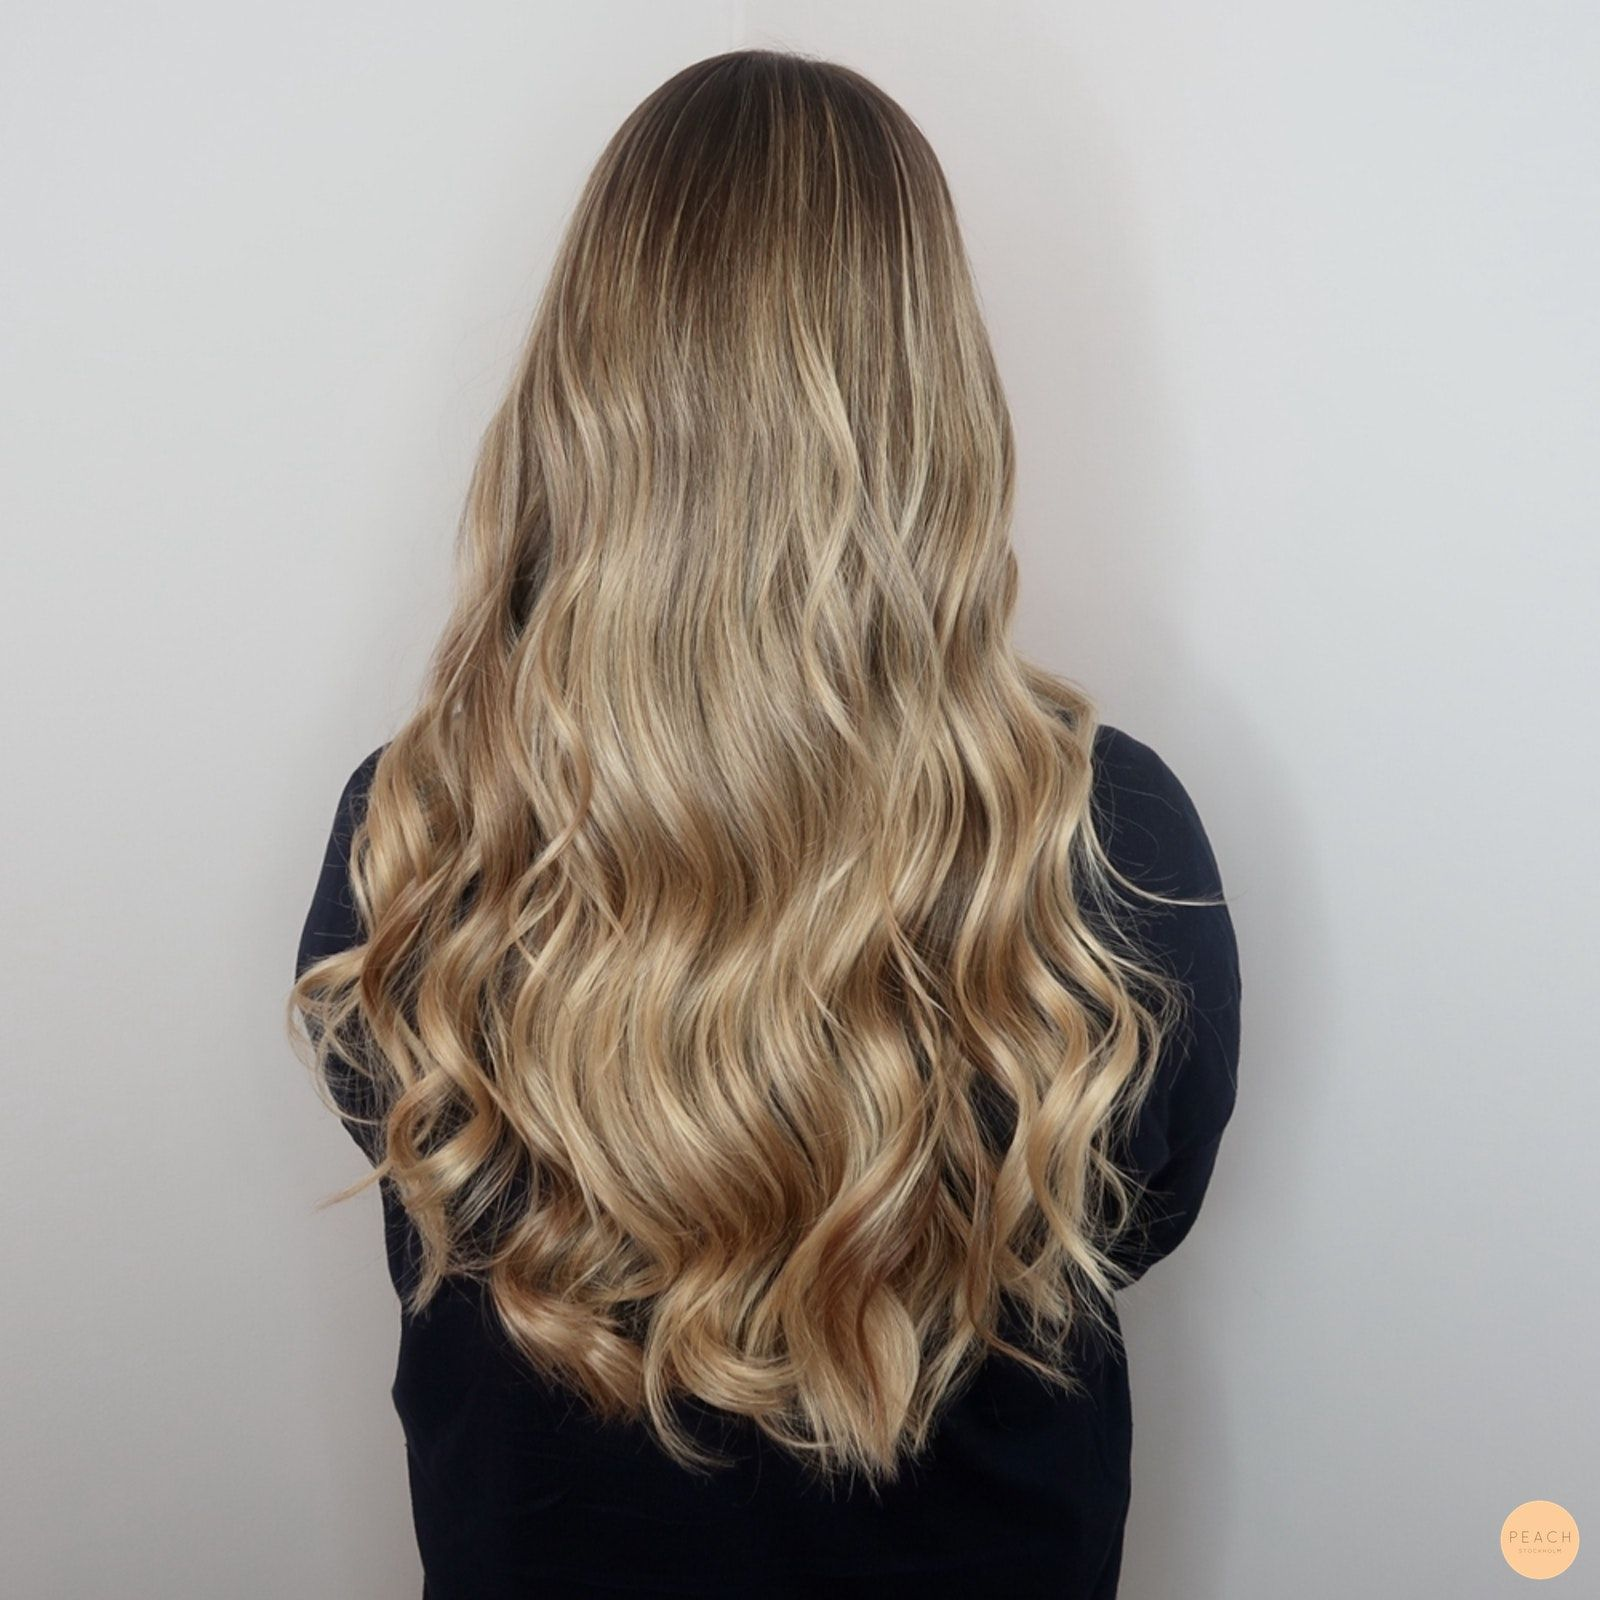 95a6f42812c9 Balayage stockholm | Hair in 2019 | Balayage, Hair, Long hair styles